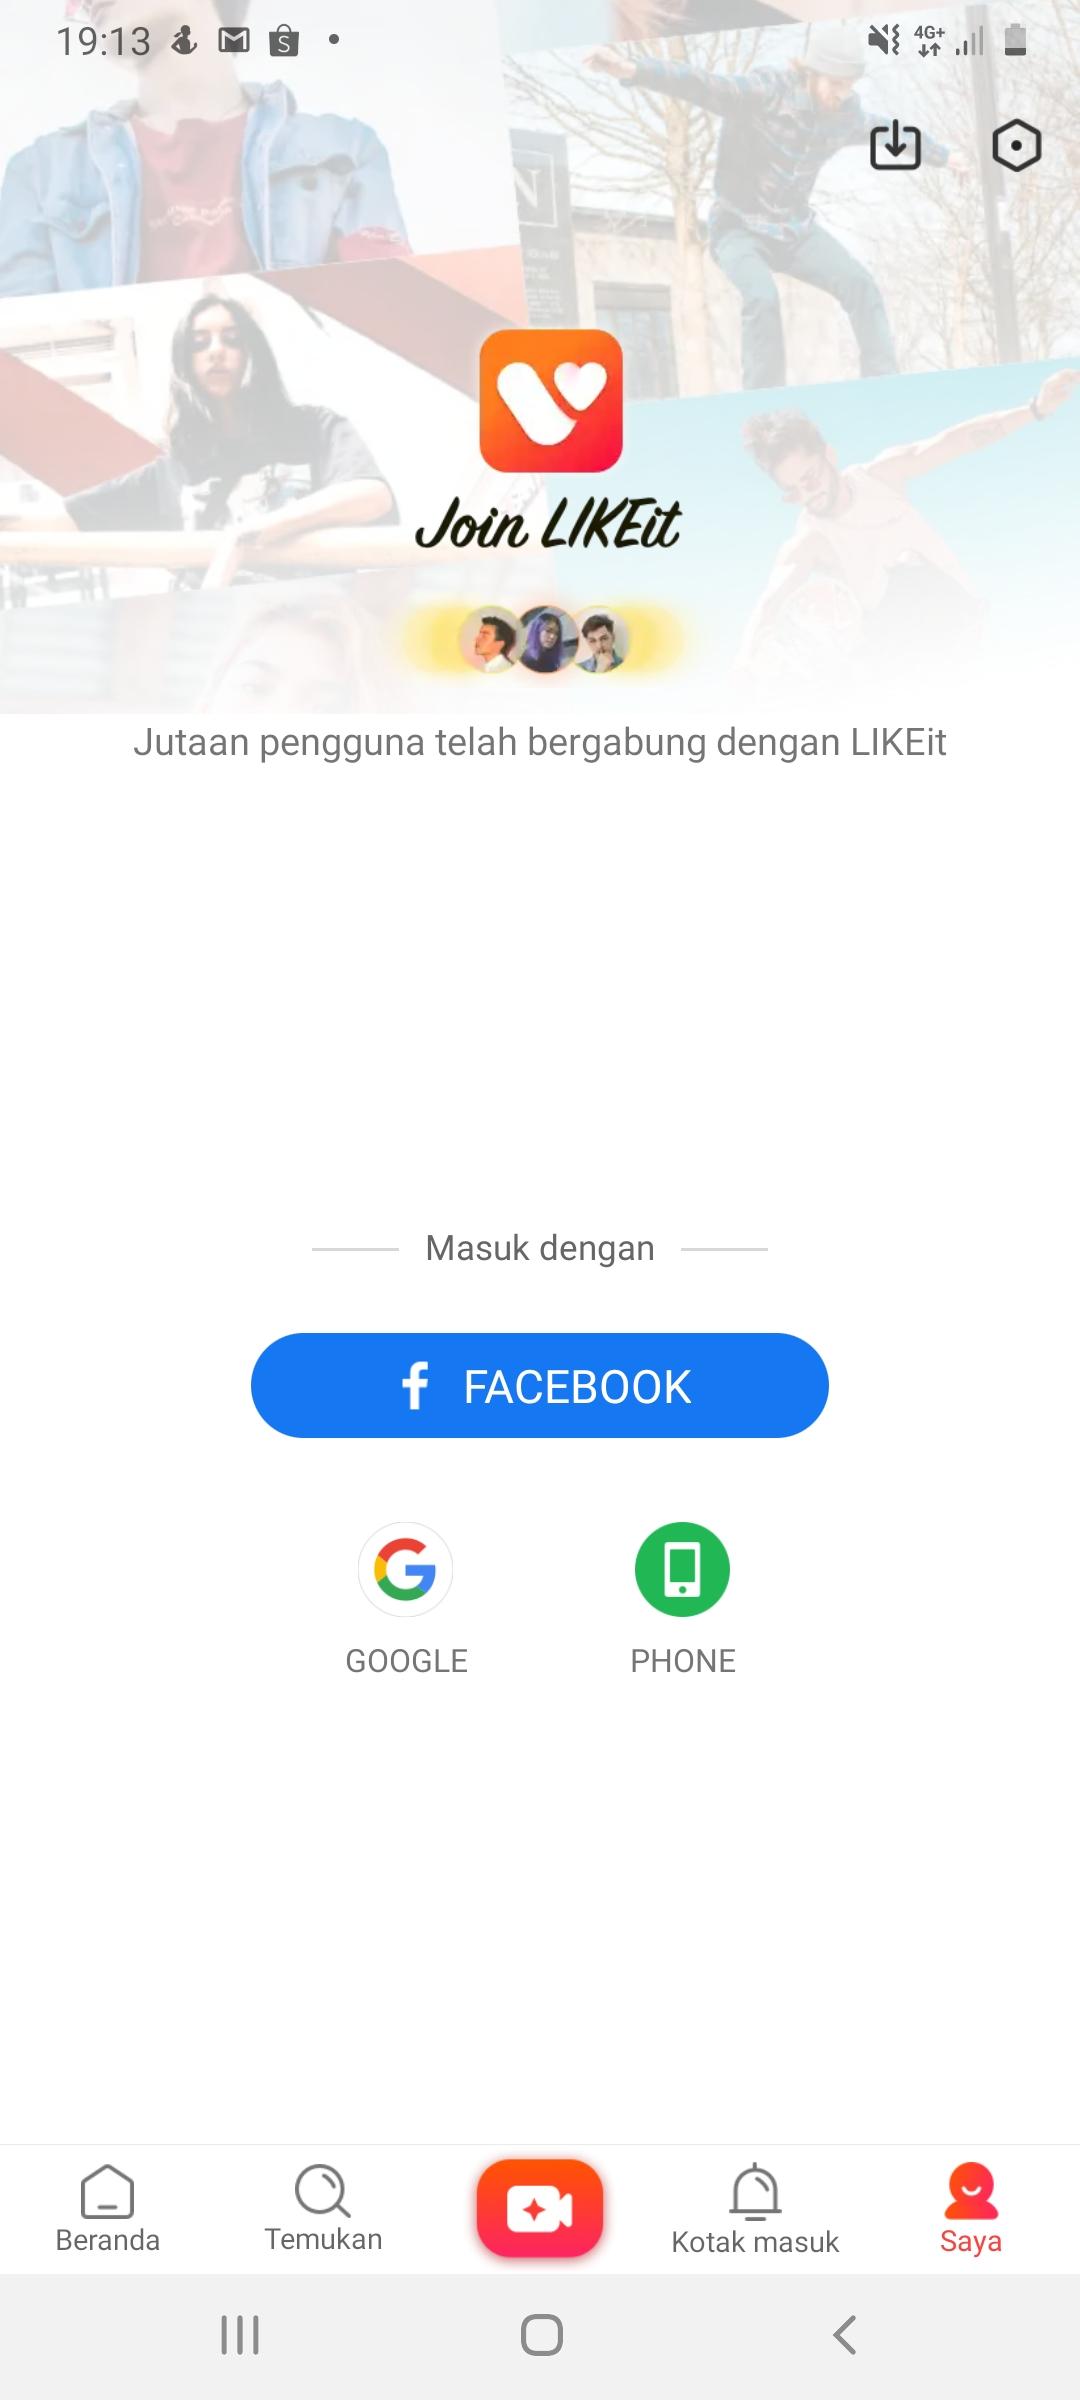 Likeit Aplikasi Penghasil Saldo Dana Gratis 2021 Terbaru Majalahkece Id